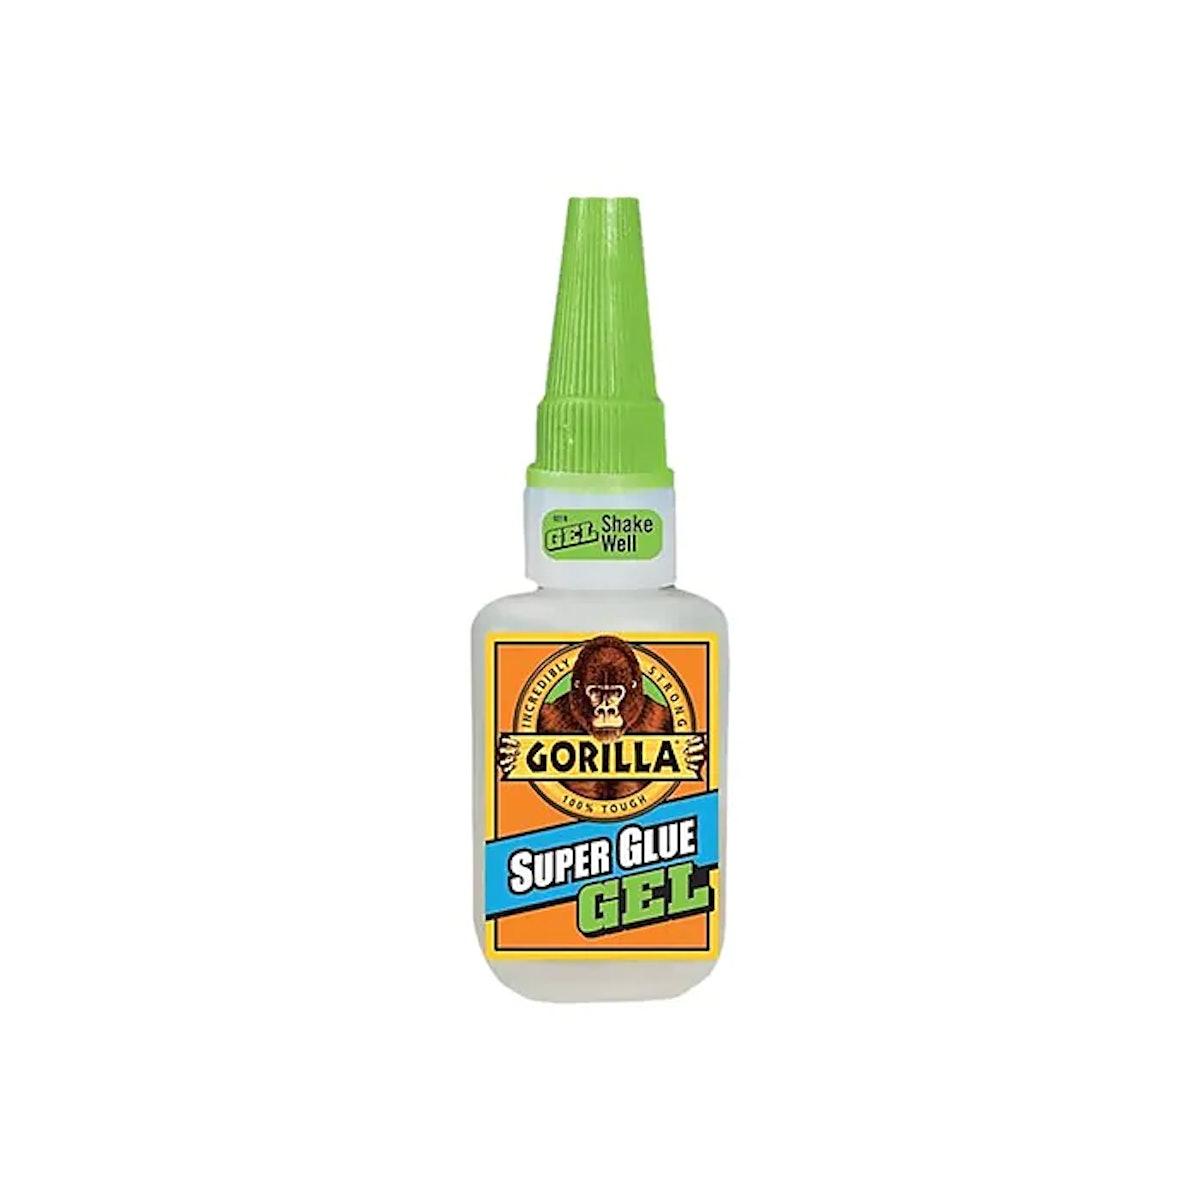 Gorilla Gel Permanent Super Glue